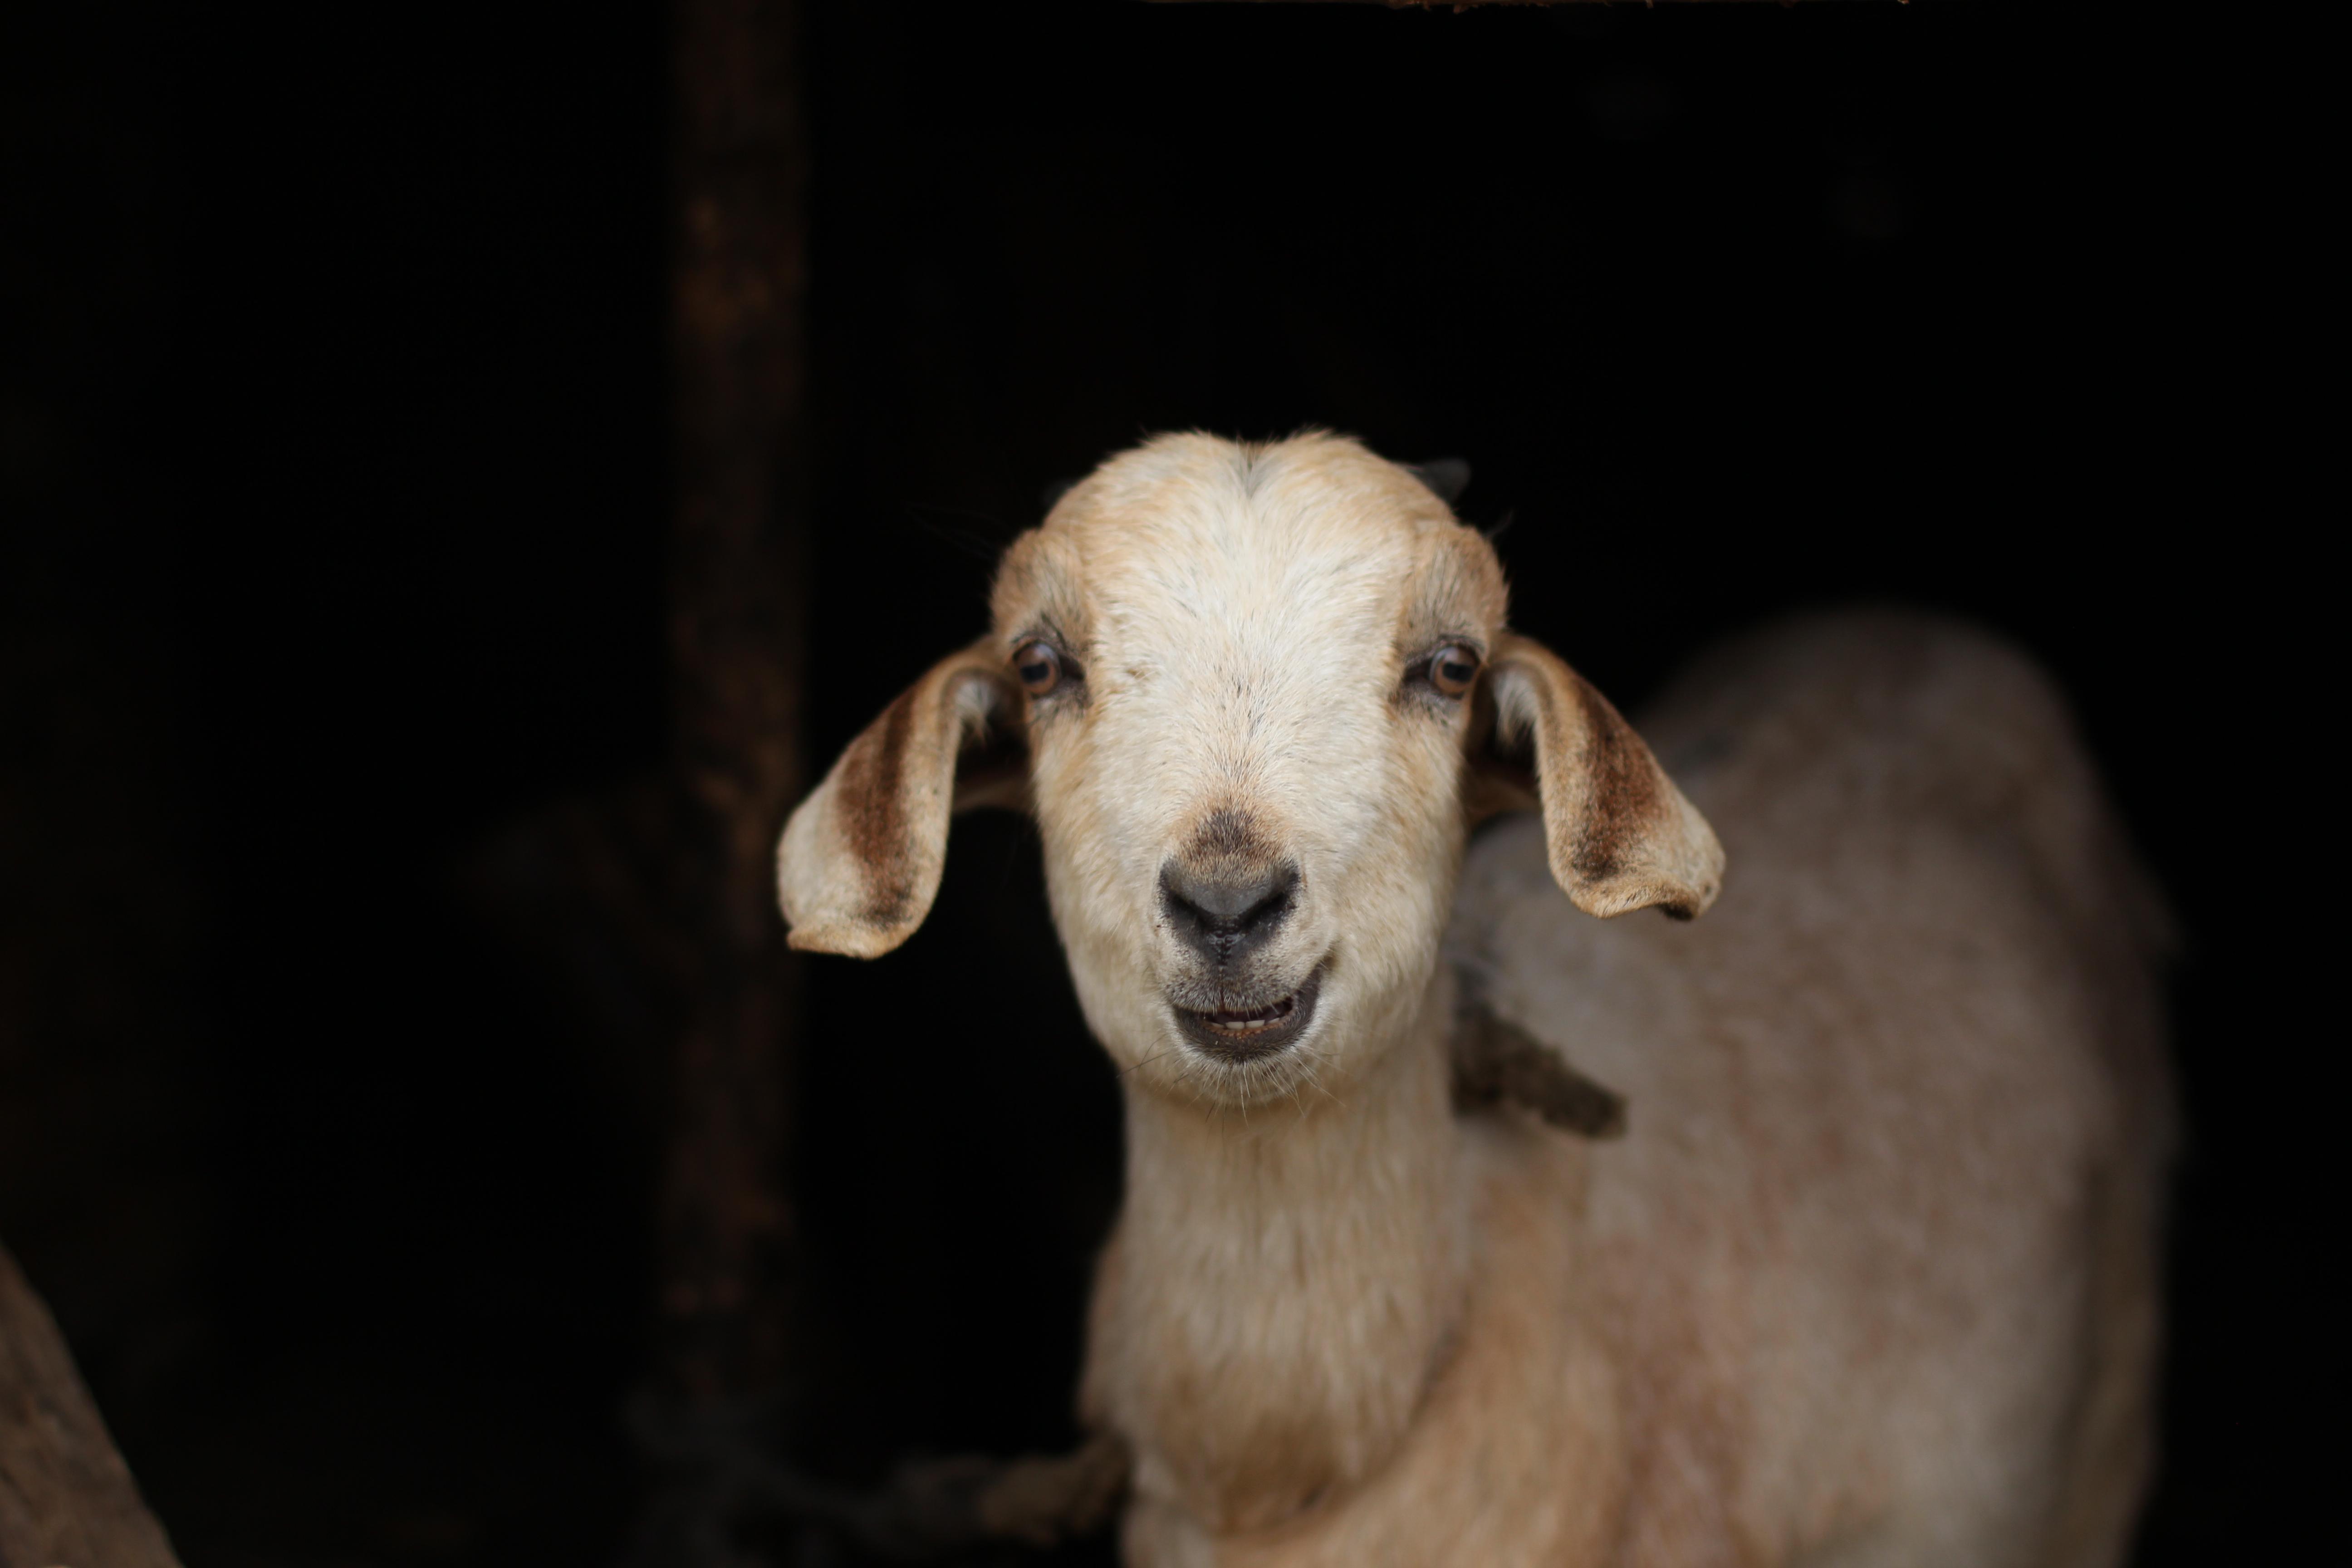 Goaty Grins